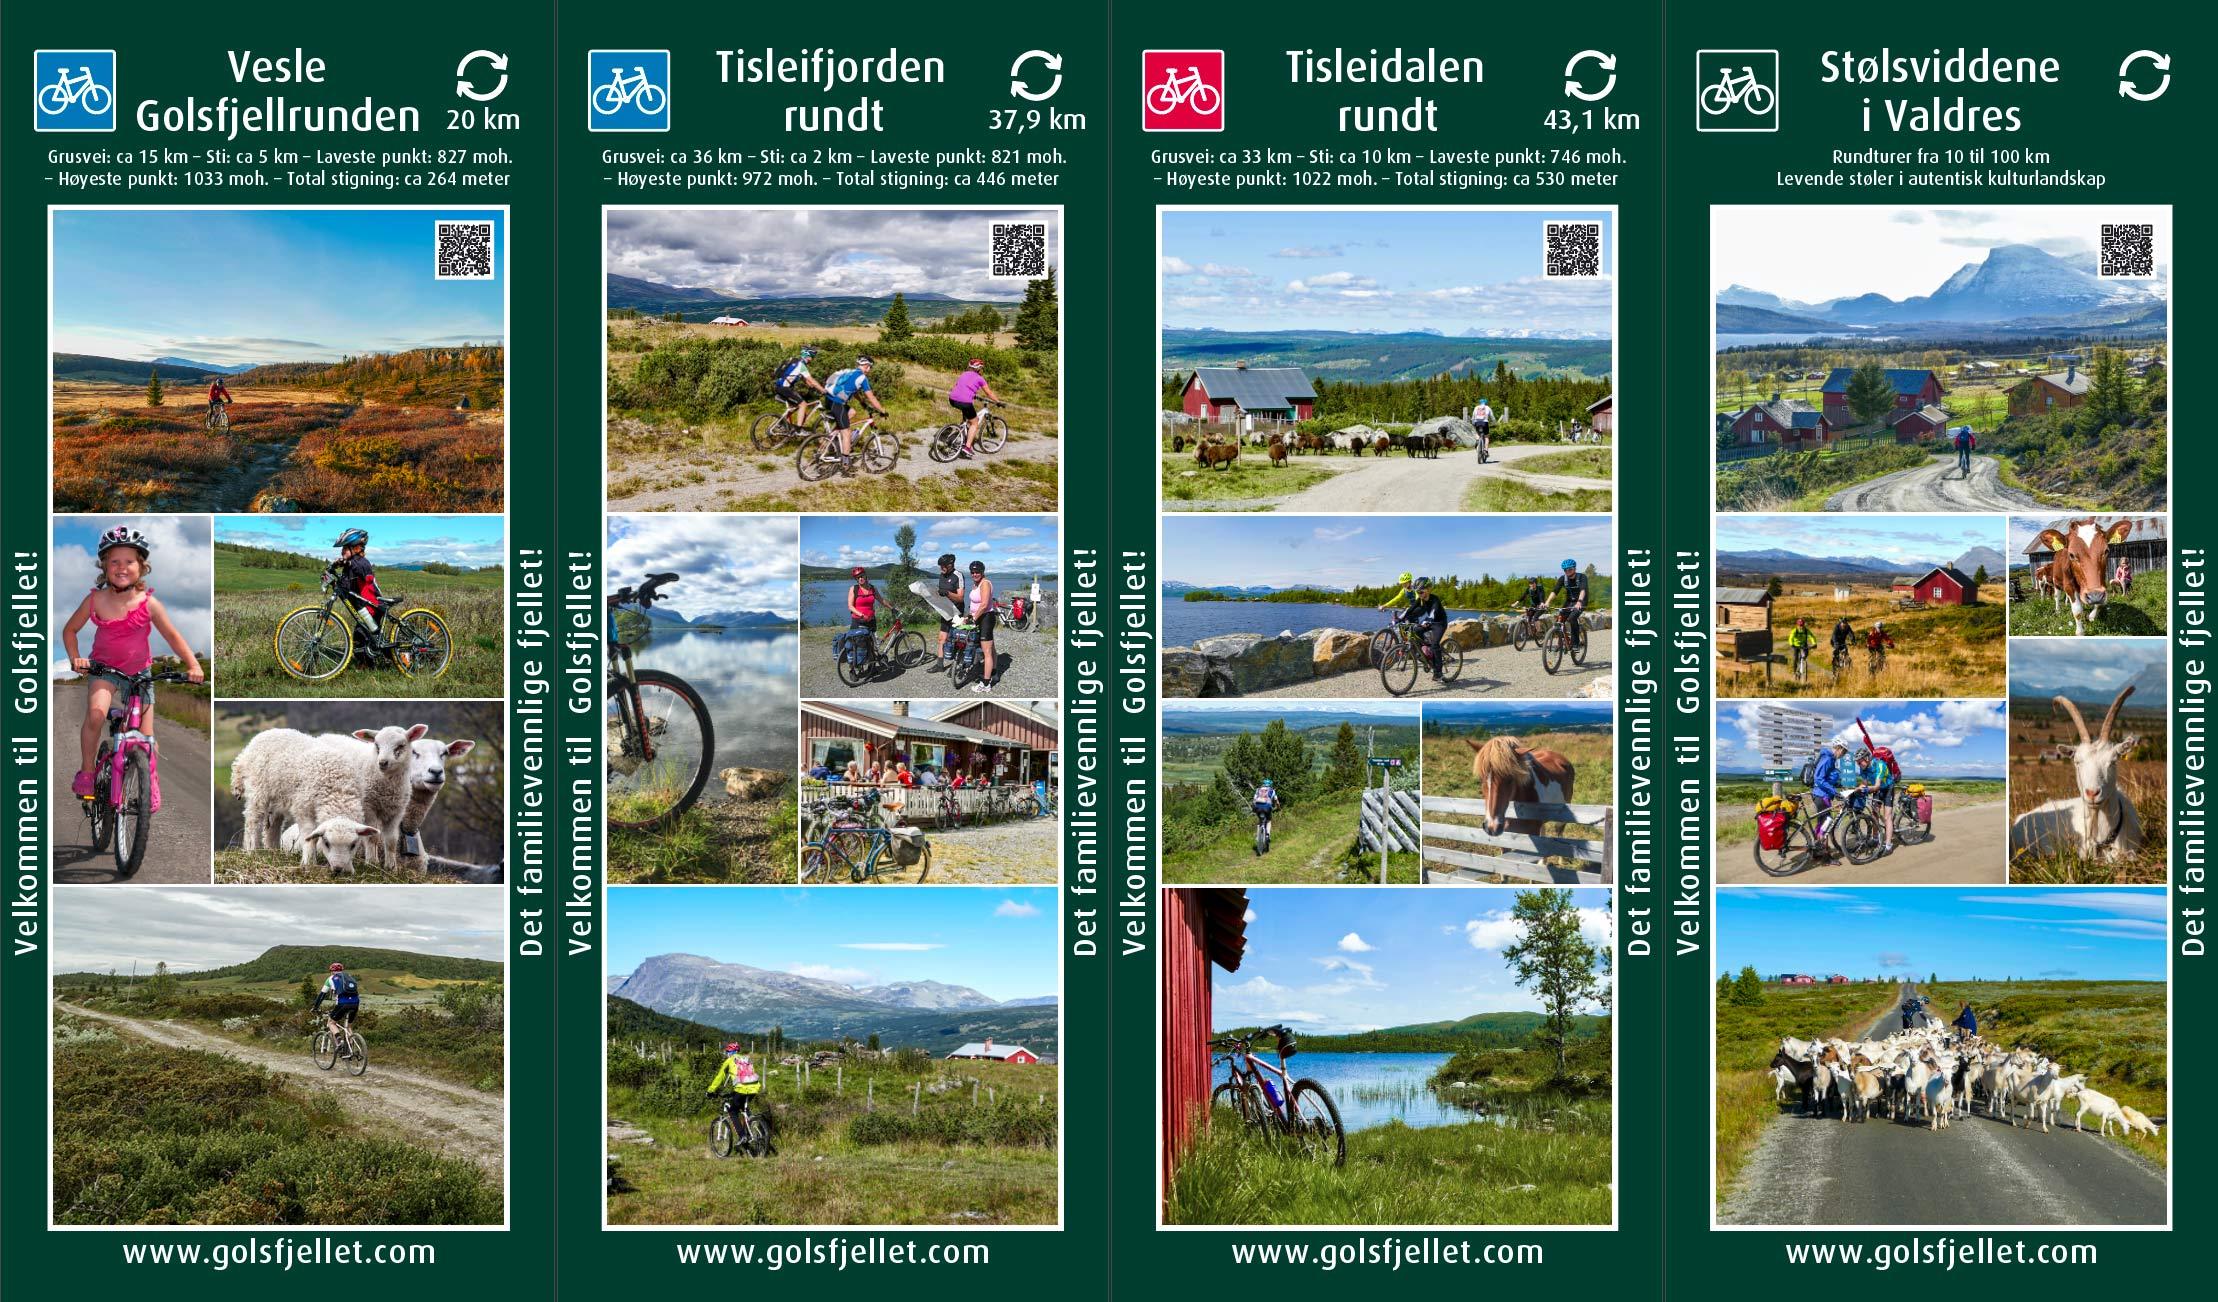 Banner Golsfjellet, Hallingdal, Valdres, TravelXpo 2020